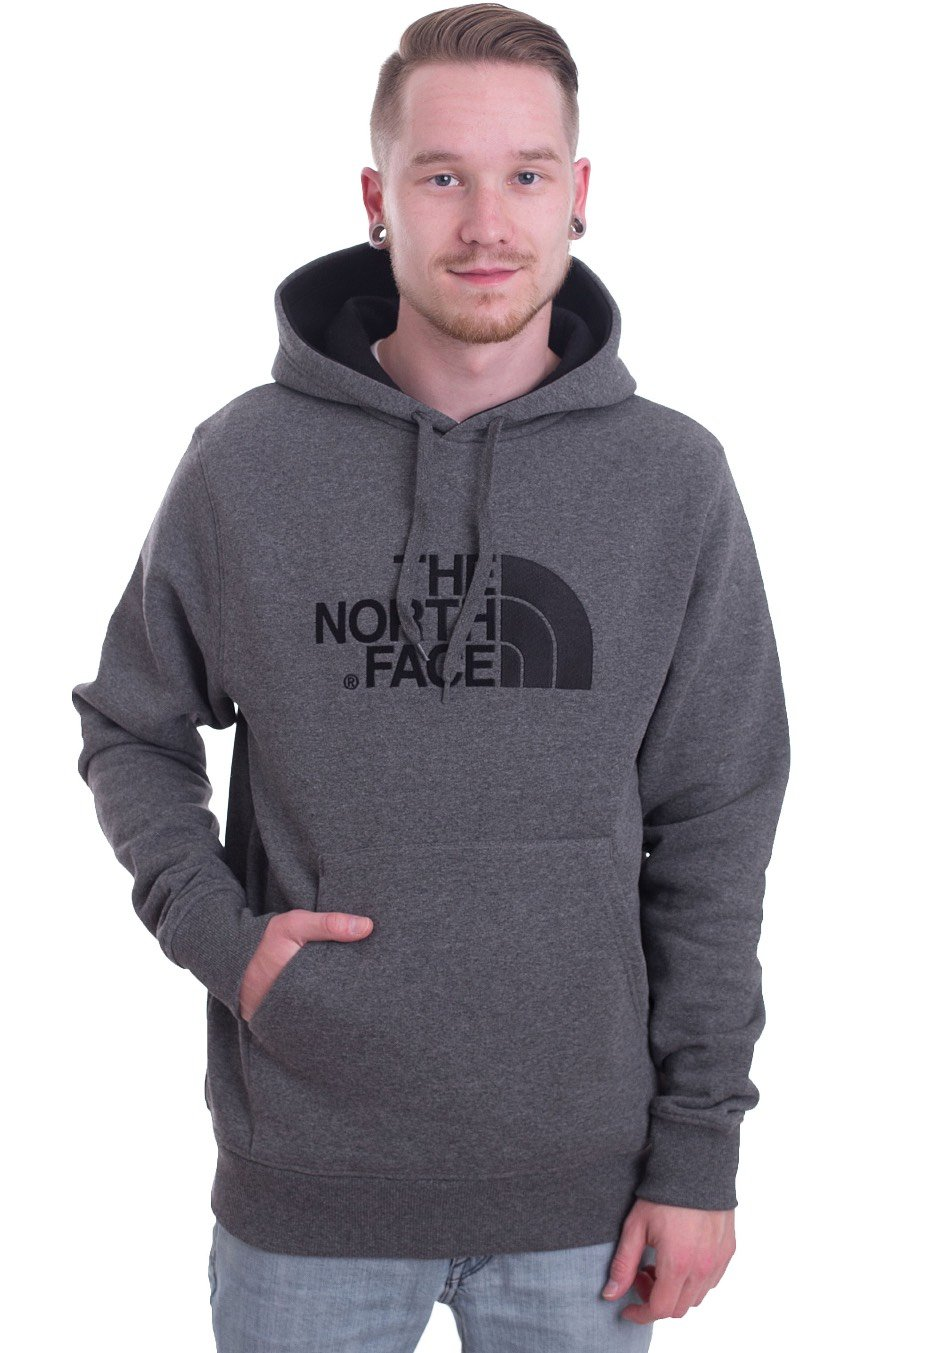 504c725a The North Face - Drew Peak TNF Medium Grey Heather/Black - Hoodie -  Streetwear Shop - Impericon.com UK